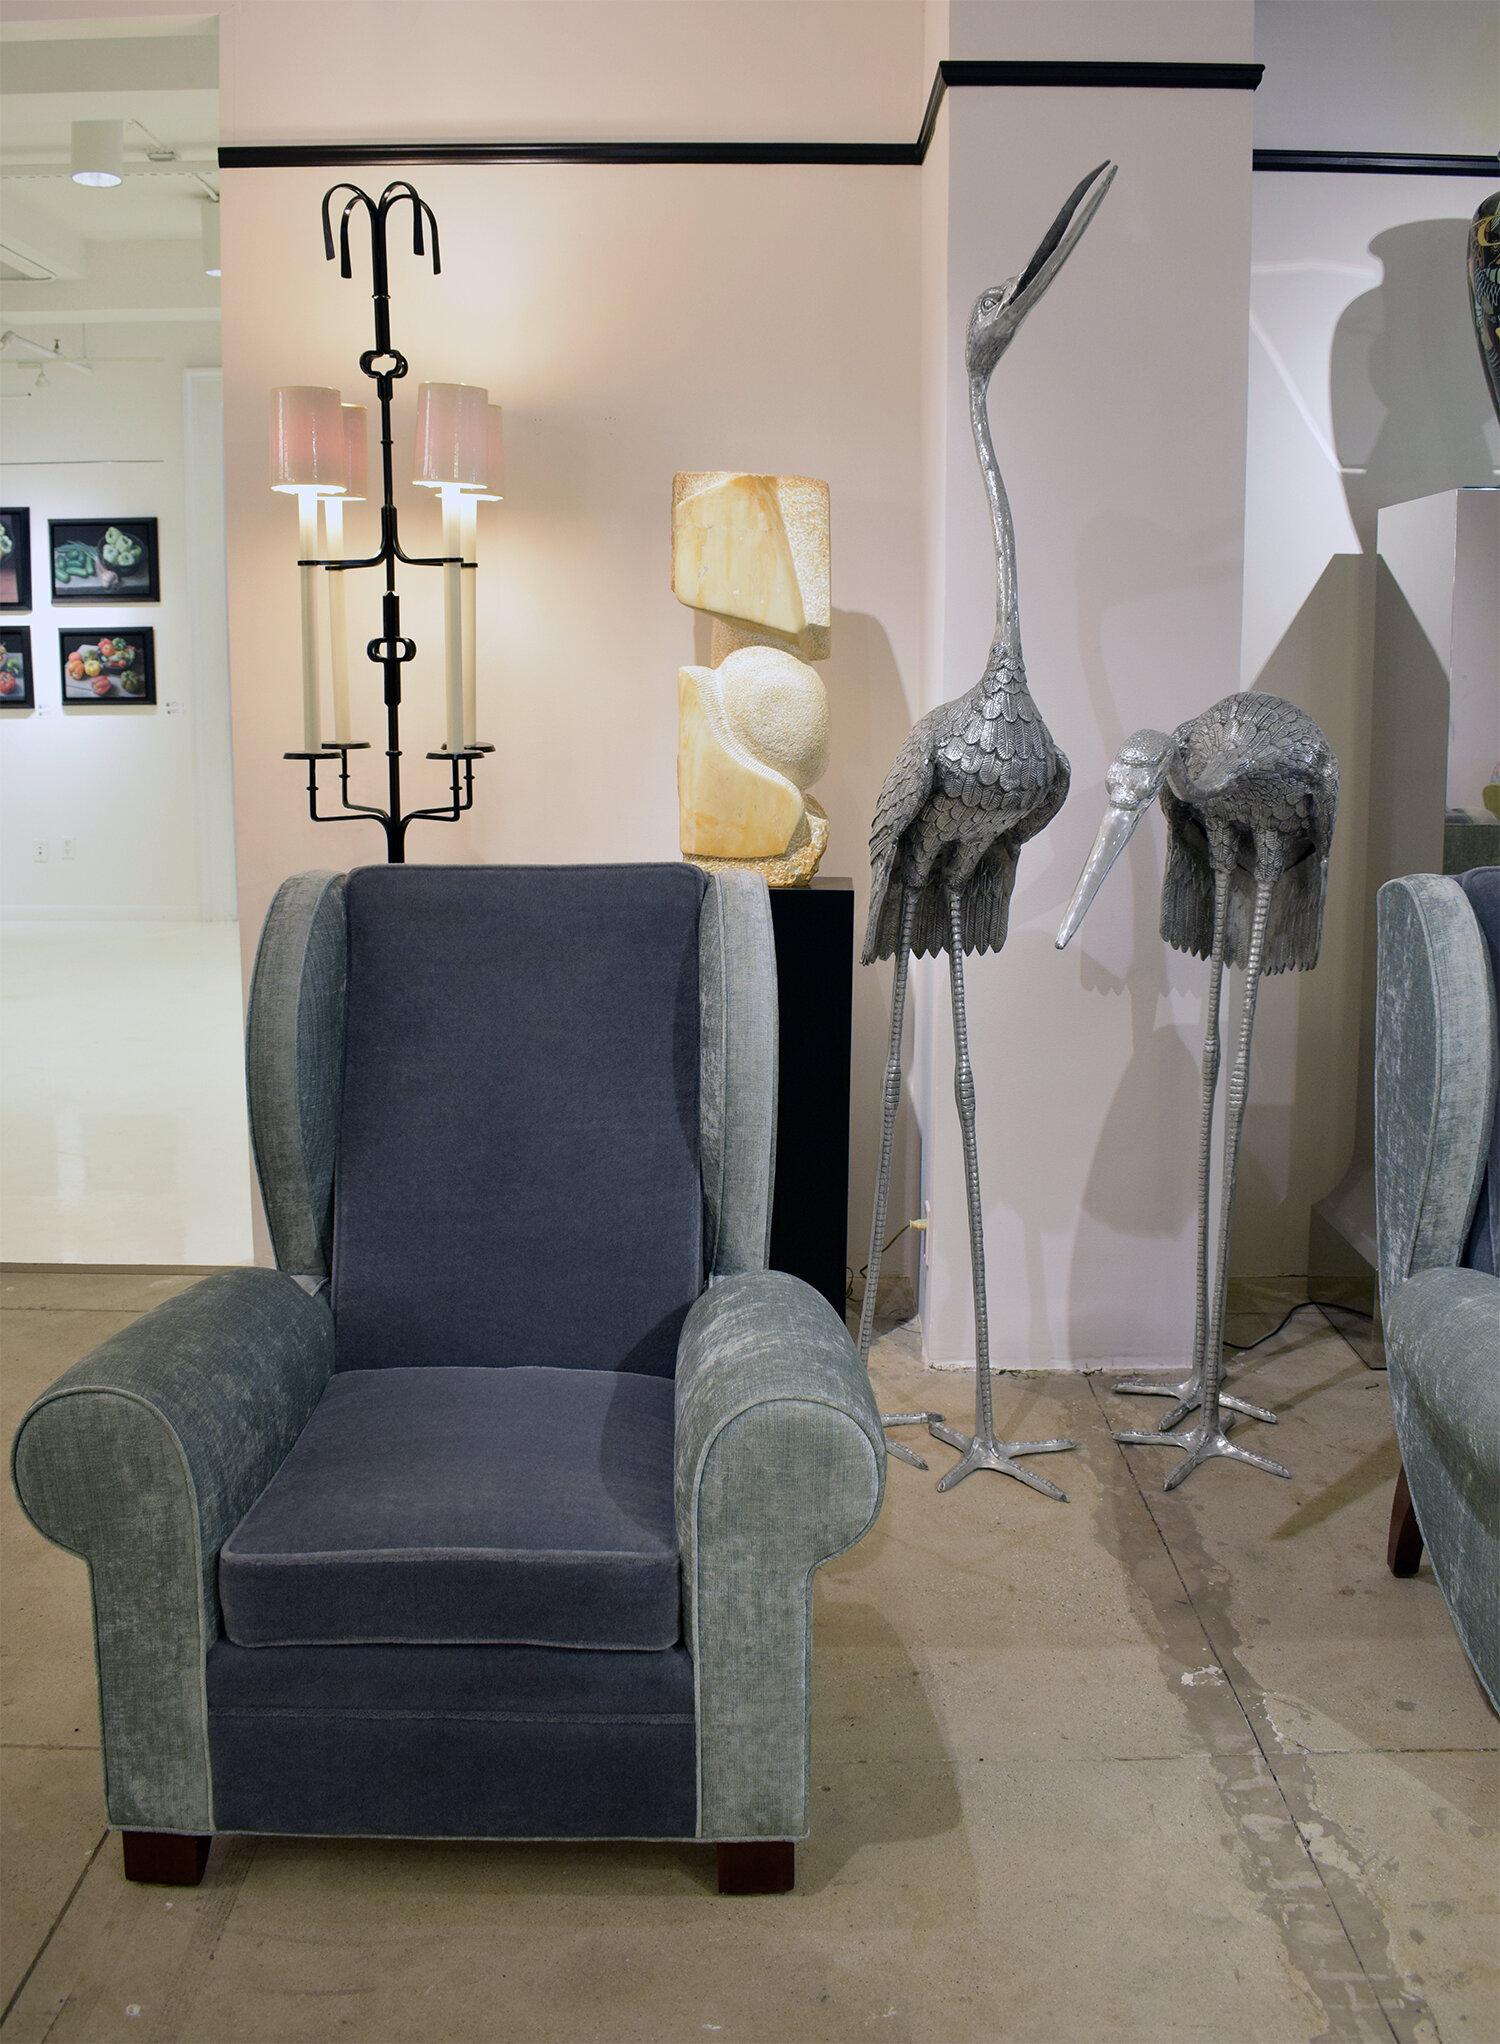 70s 75 pr egrets alum monumentl sculpture137 envm.jpg